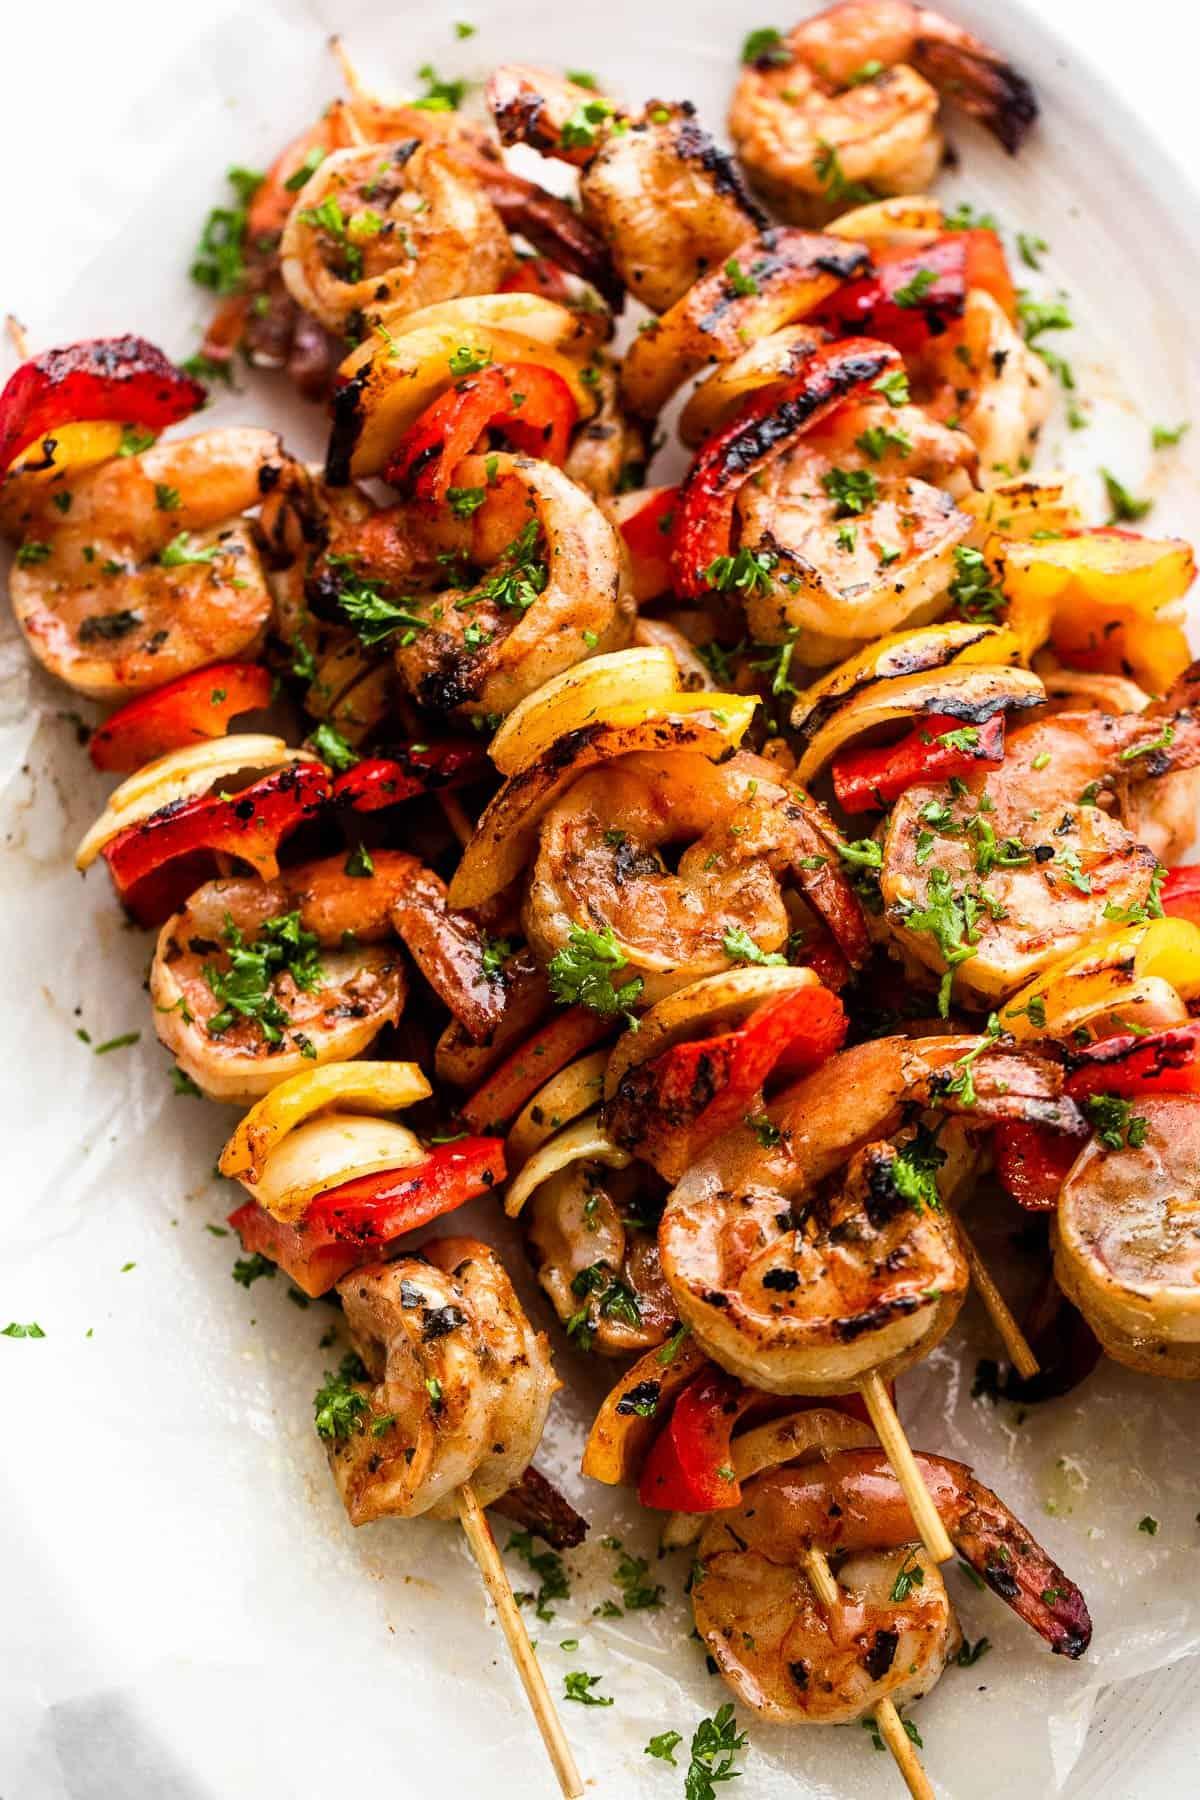 Grilled Shrimp Kabobs on a plate